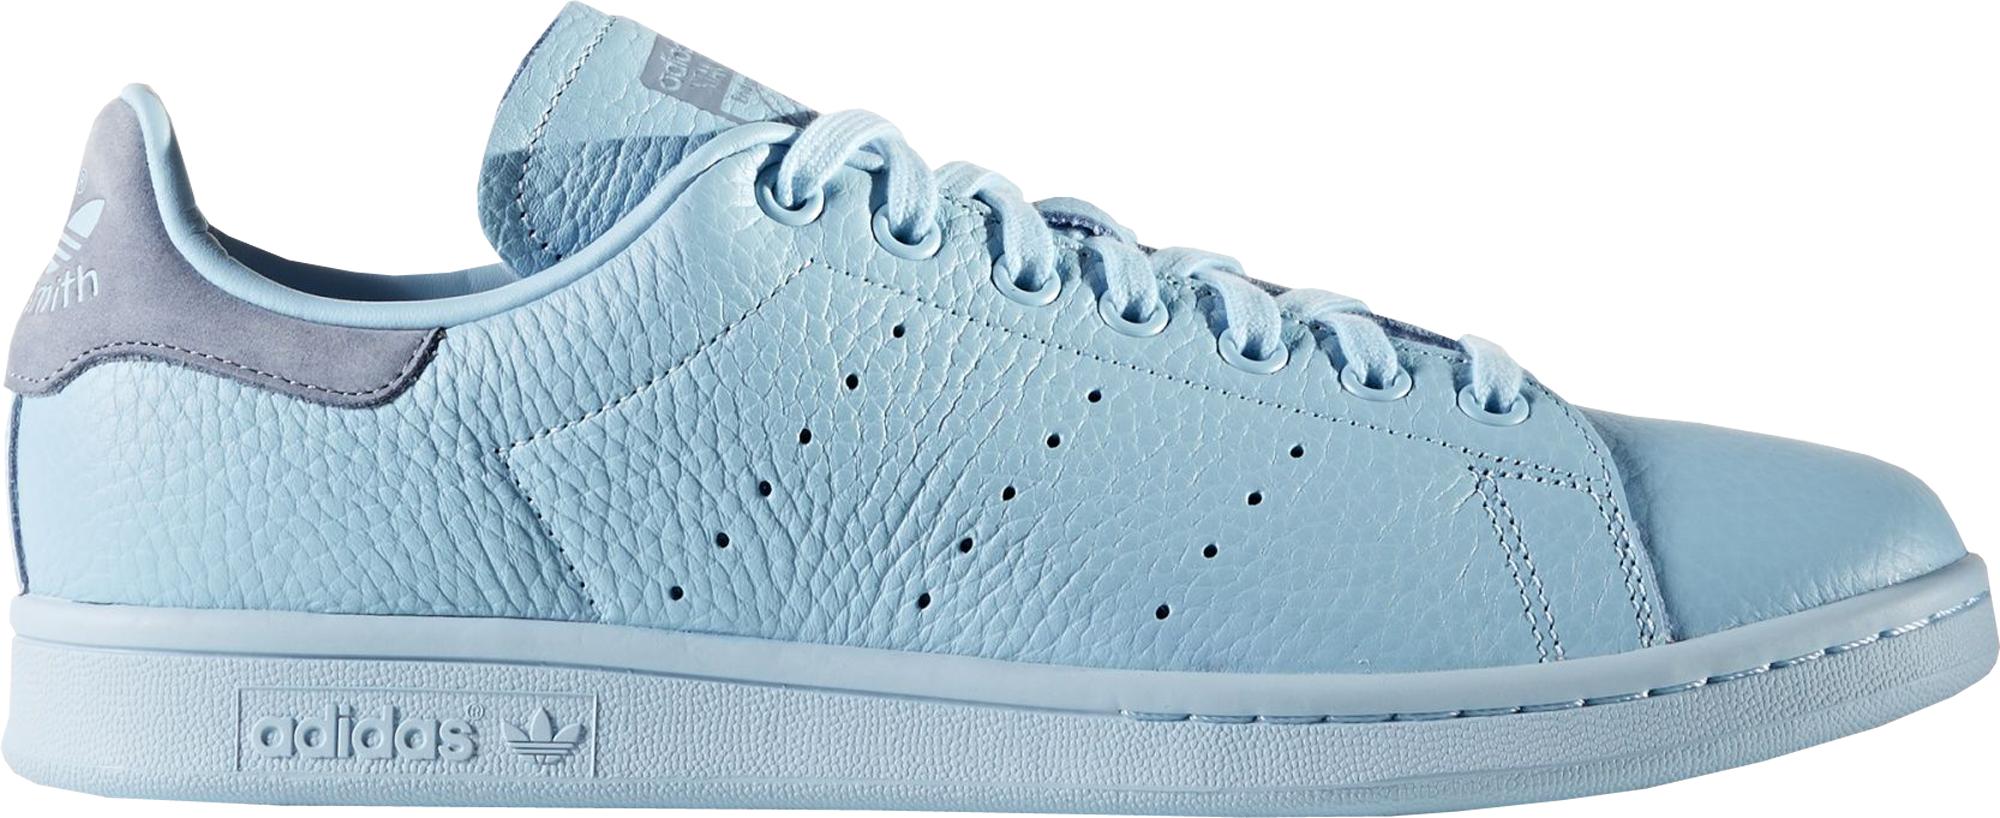 adidas Stan Smith Pharrell Icey Blue